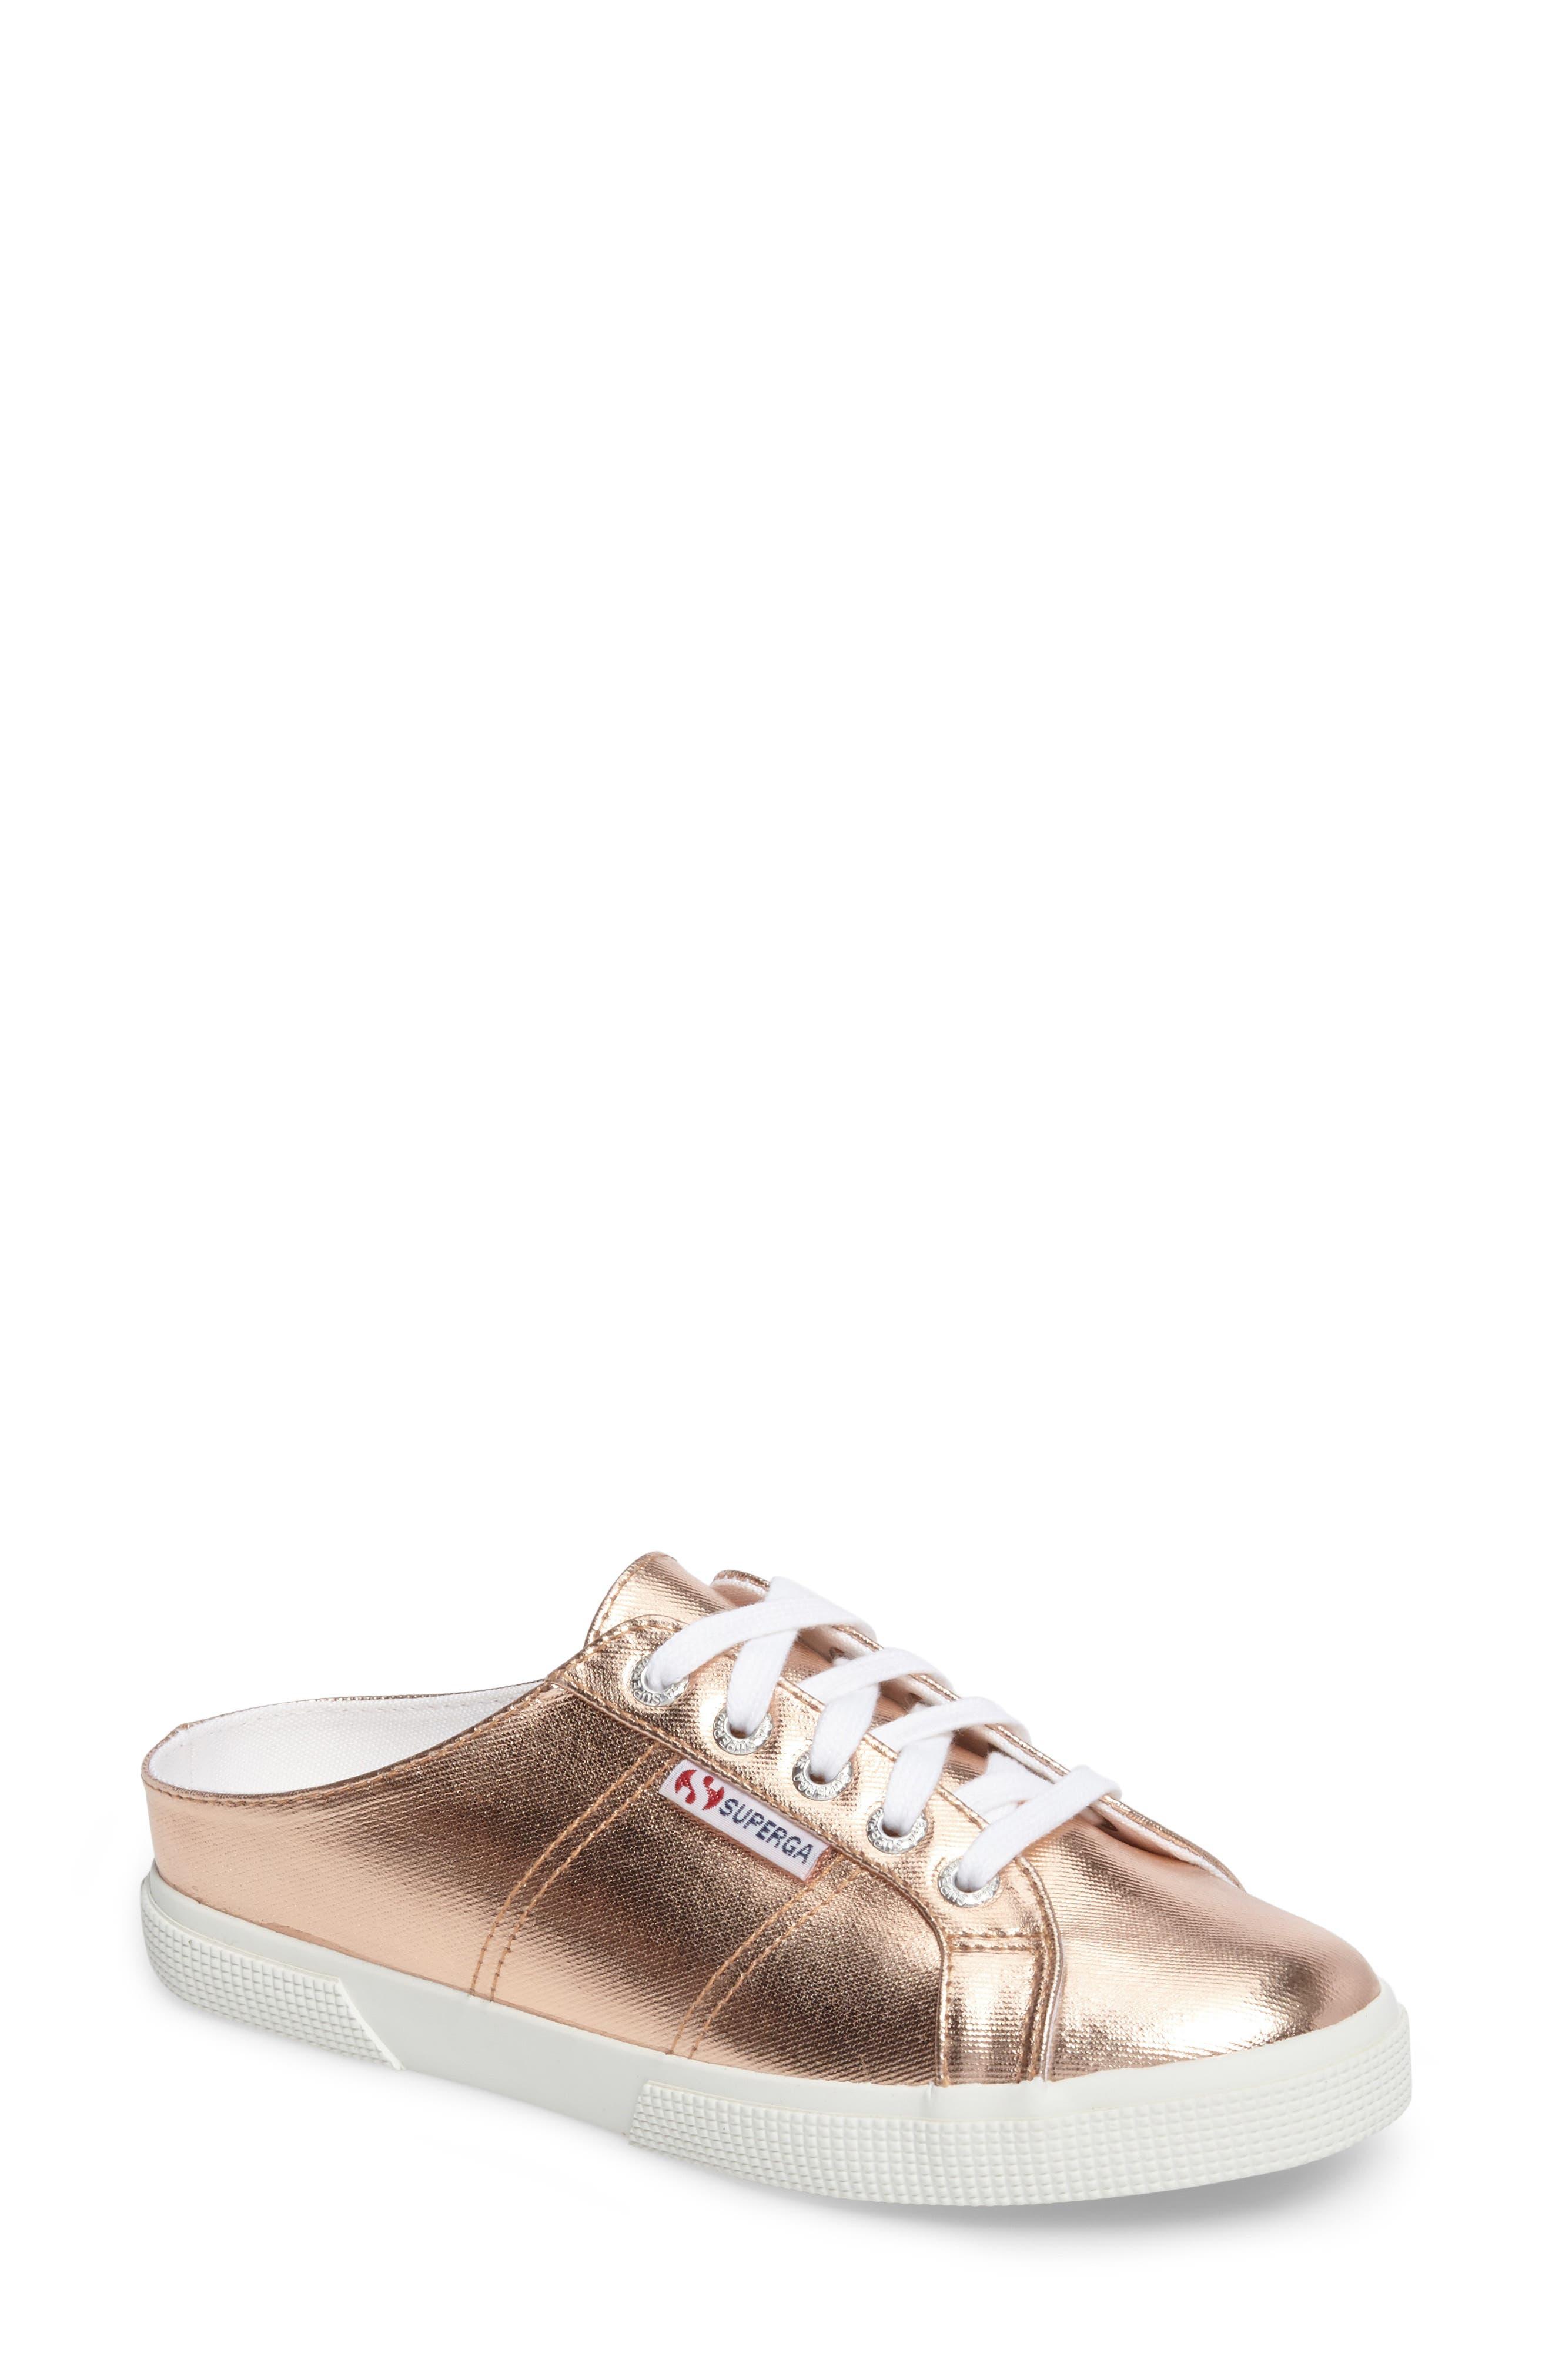 Superga 2288 Sneaker Mule (Women)